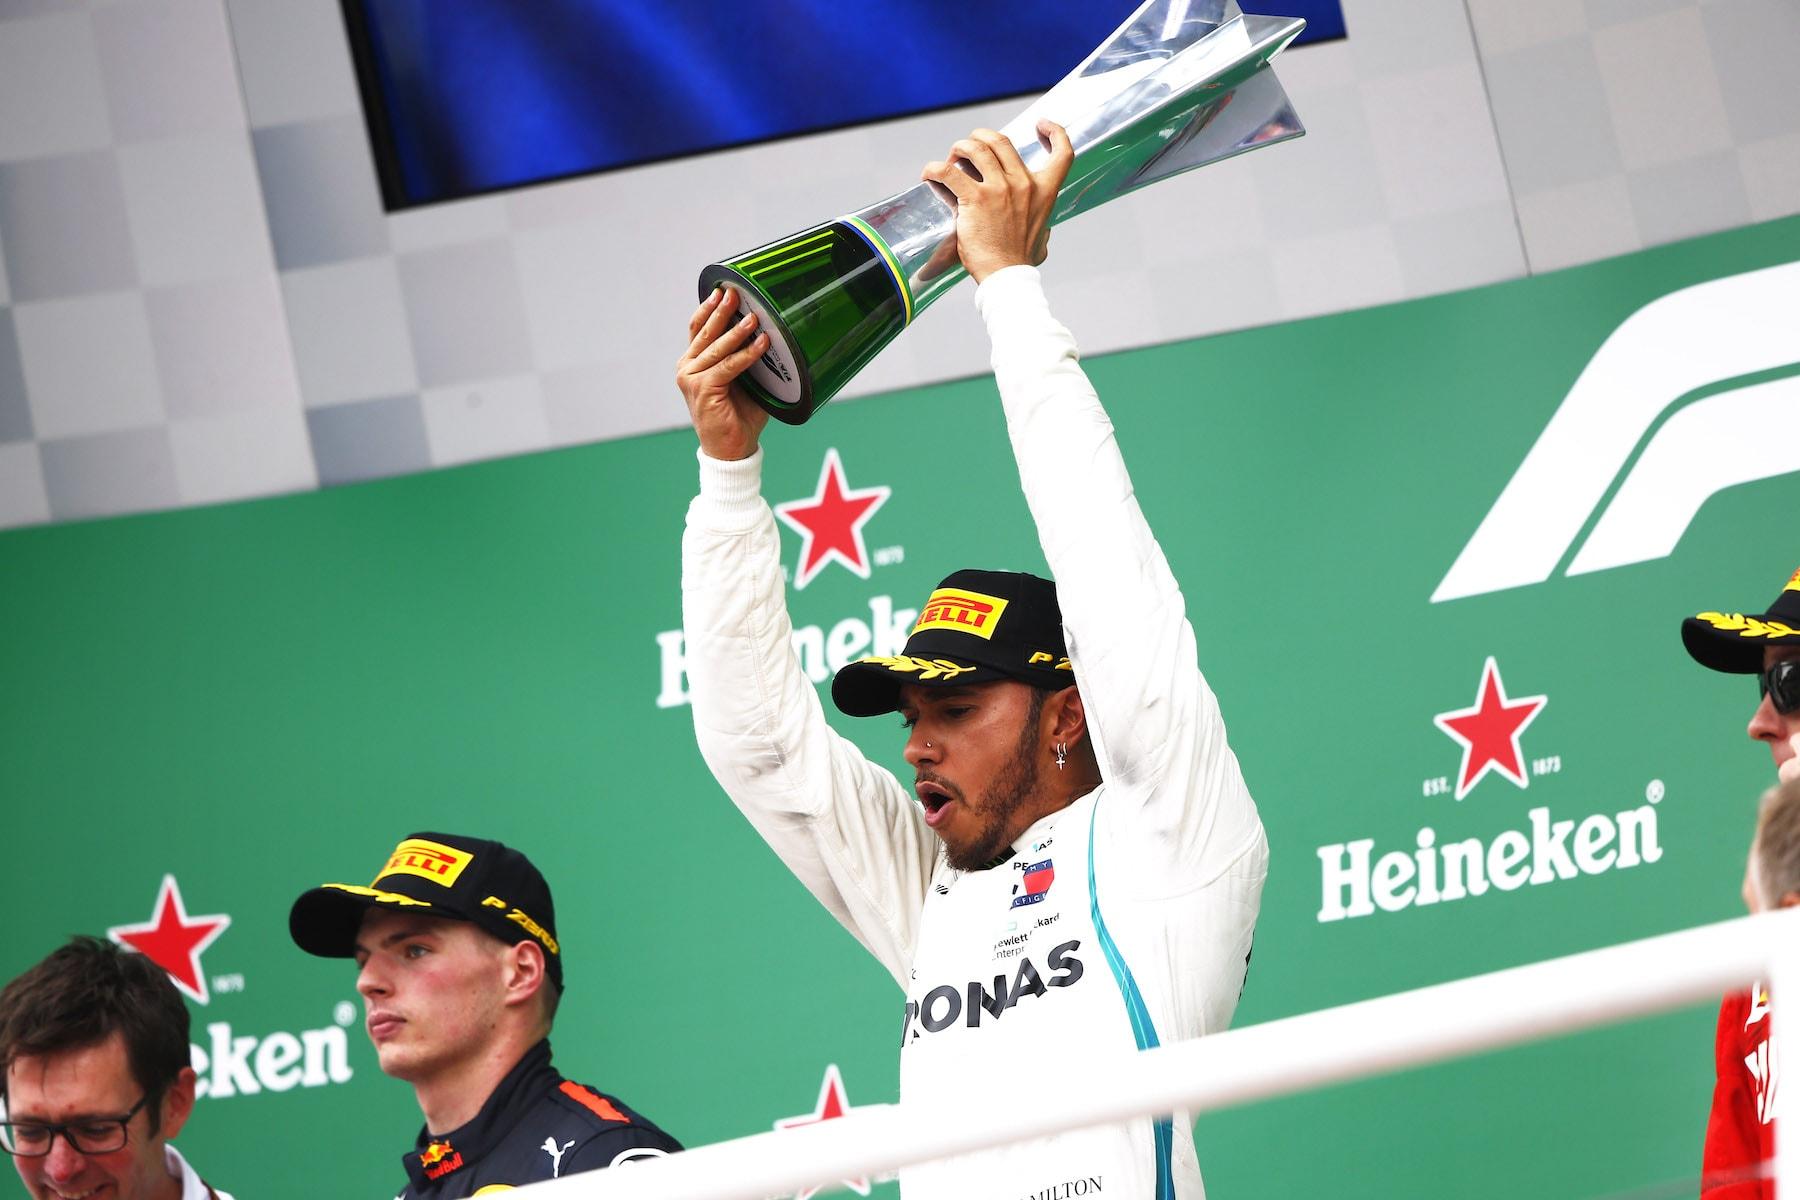 S 2018 Lewis Hamilton | Mercedes W09 | 2018 Brazilian GP winner 3 copy.jpg